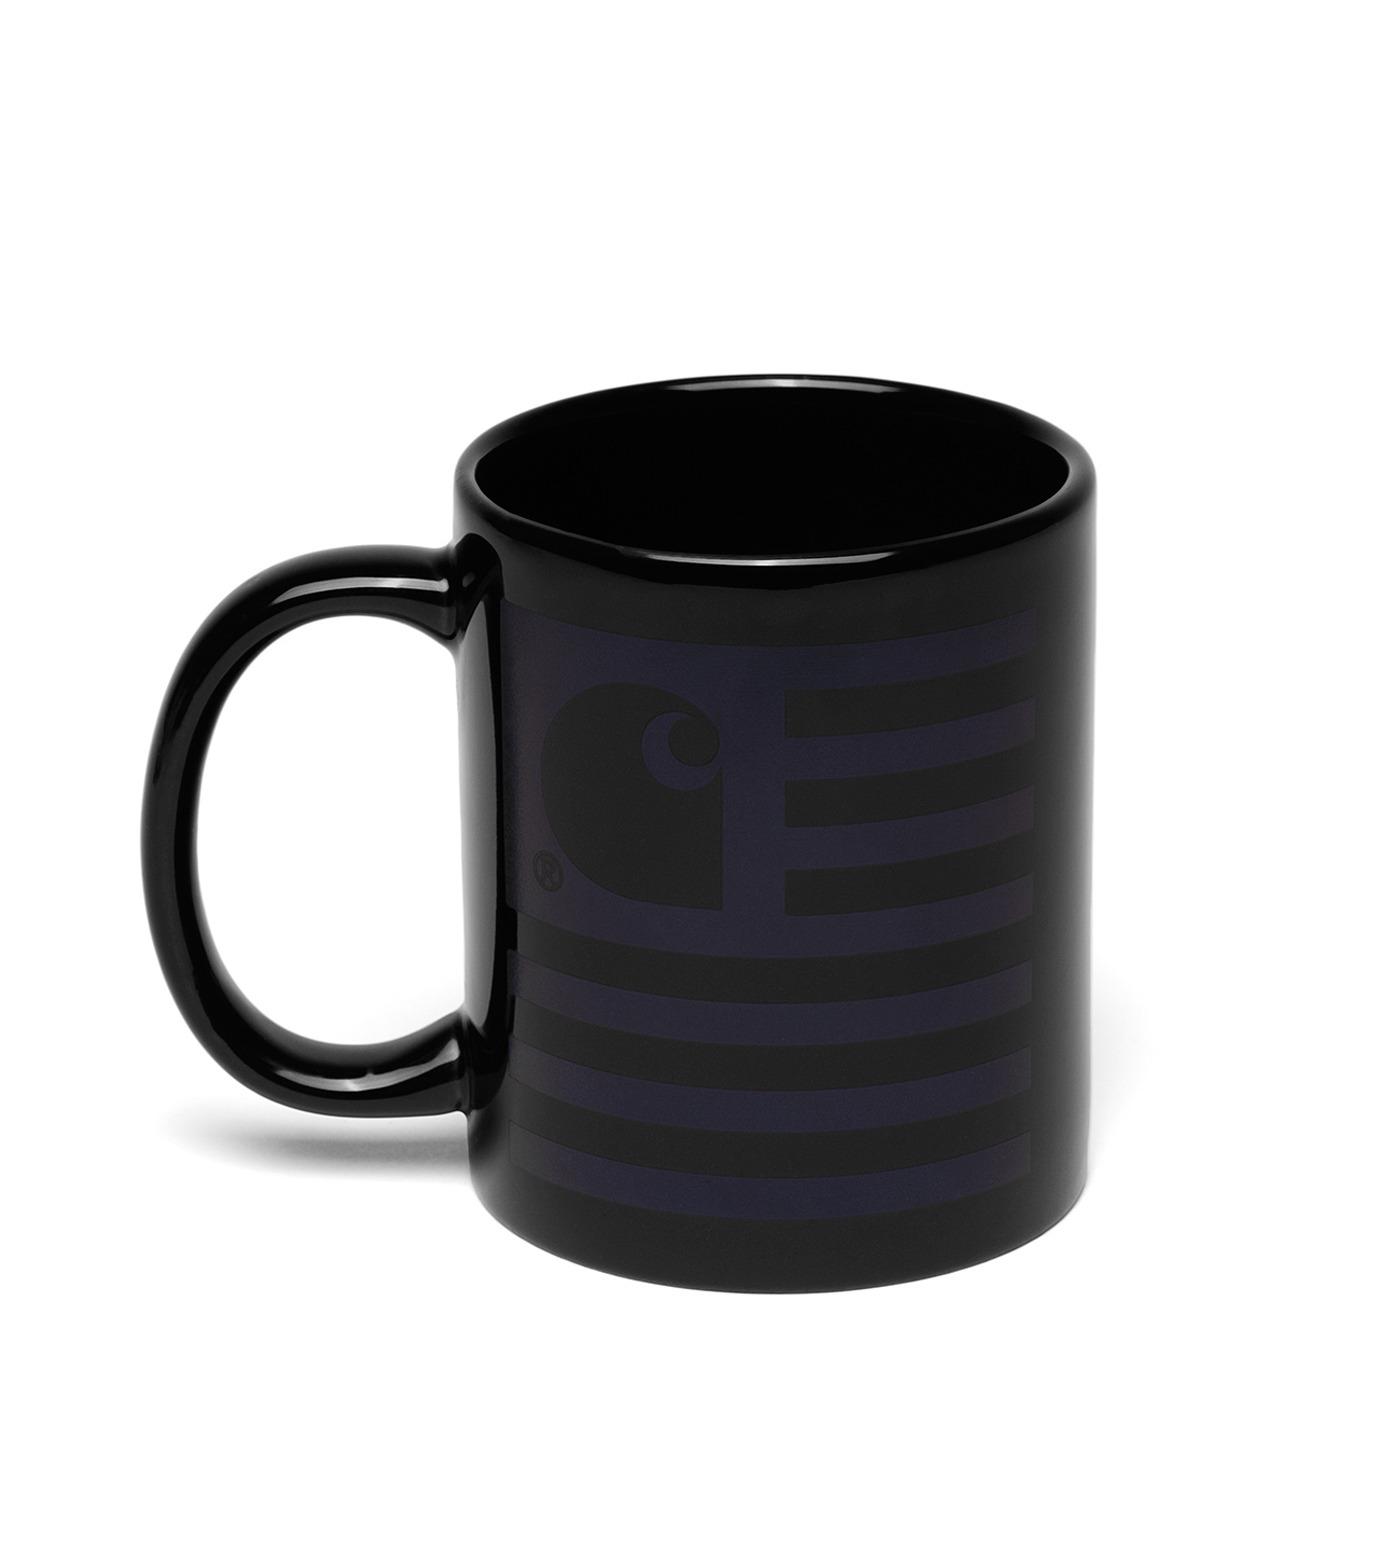 Carhartt(カーハート)のCOFFEE MUG-BLACK(キッチン/kitchen)-I018142-15F-13 拡大詳細画像1